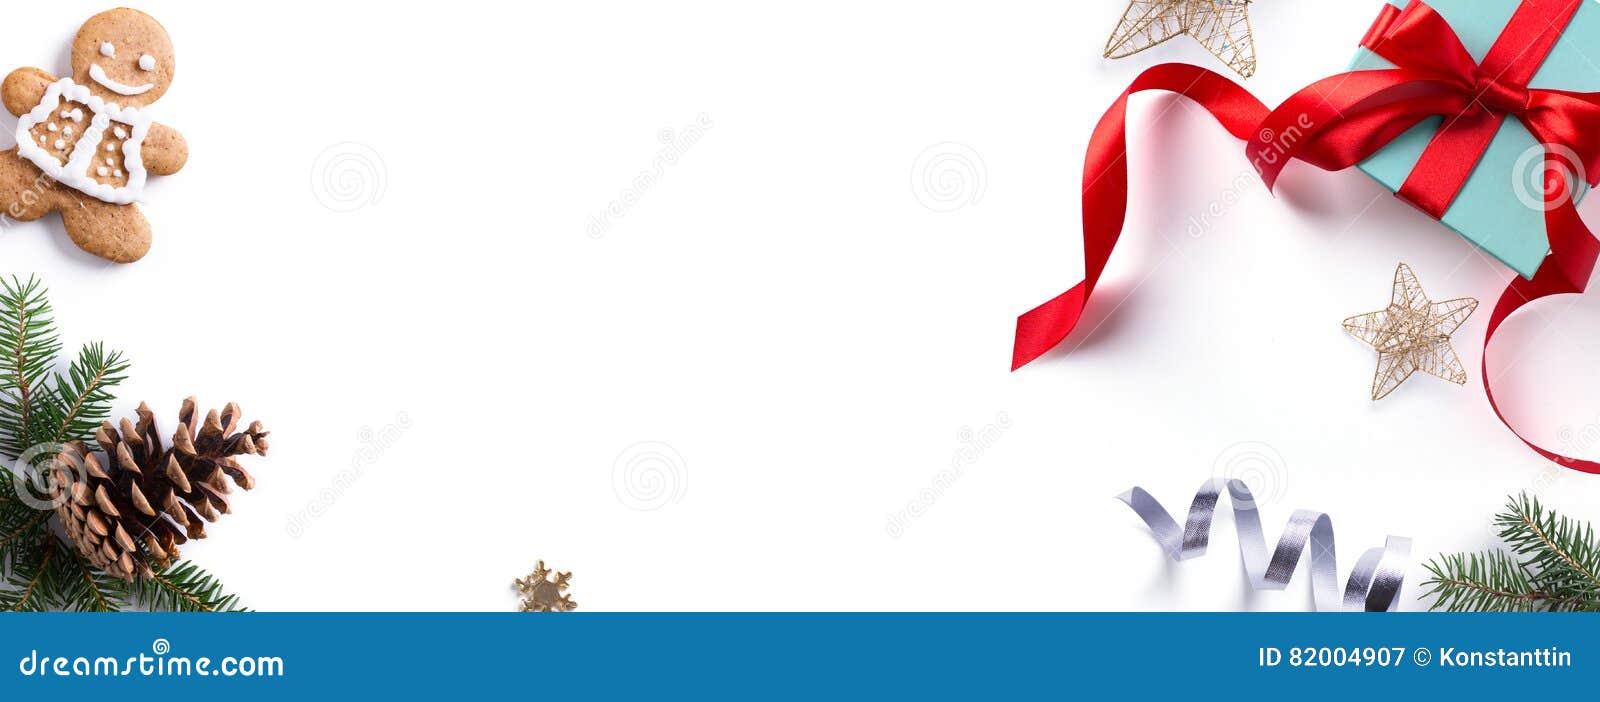 Christmas holiday Decoration element; Christmas border